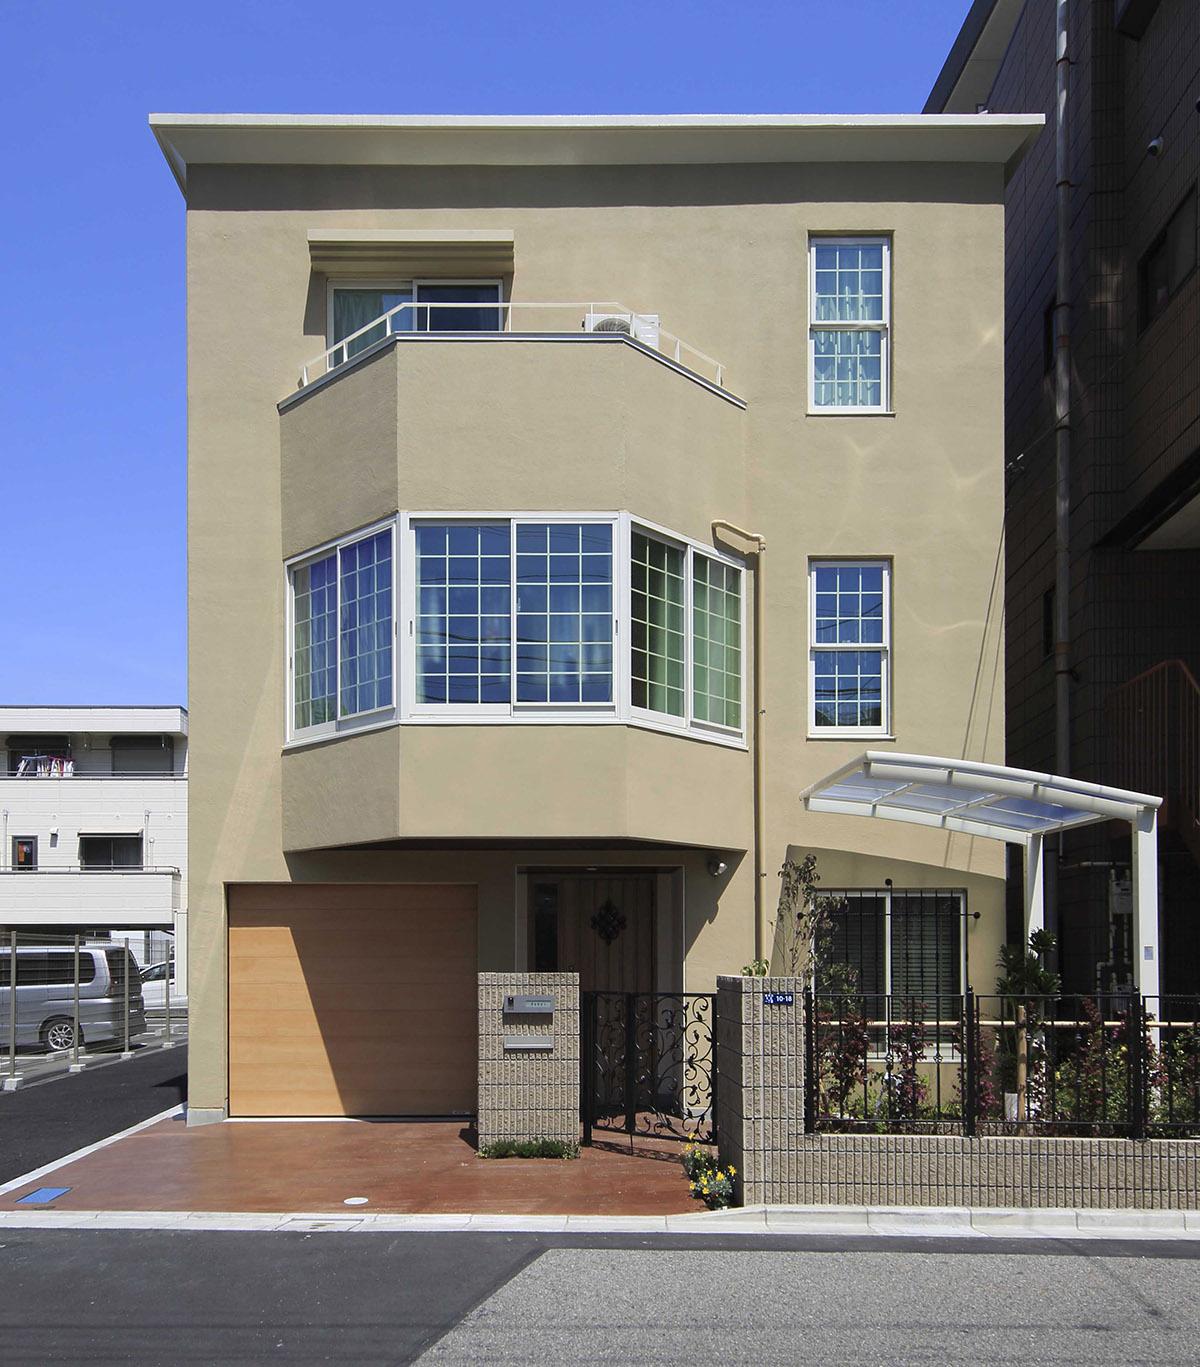 Bunka house